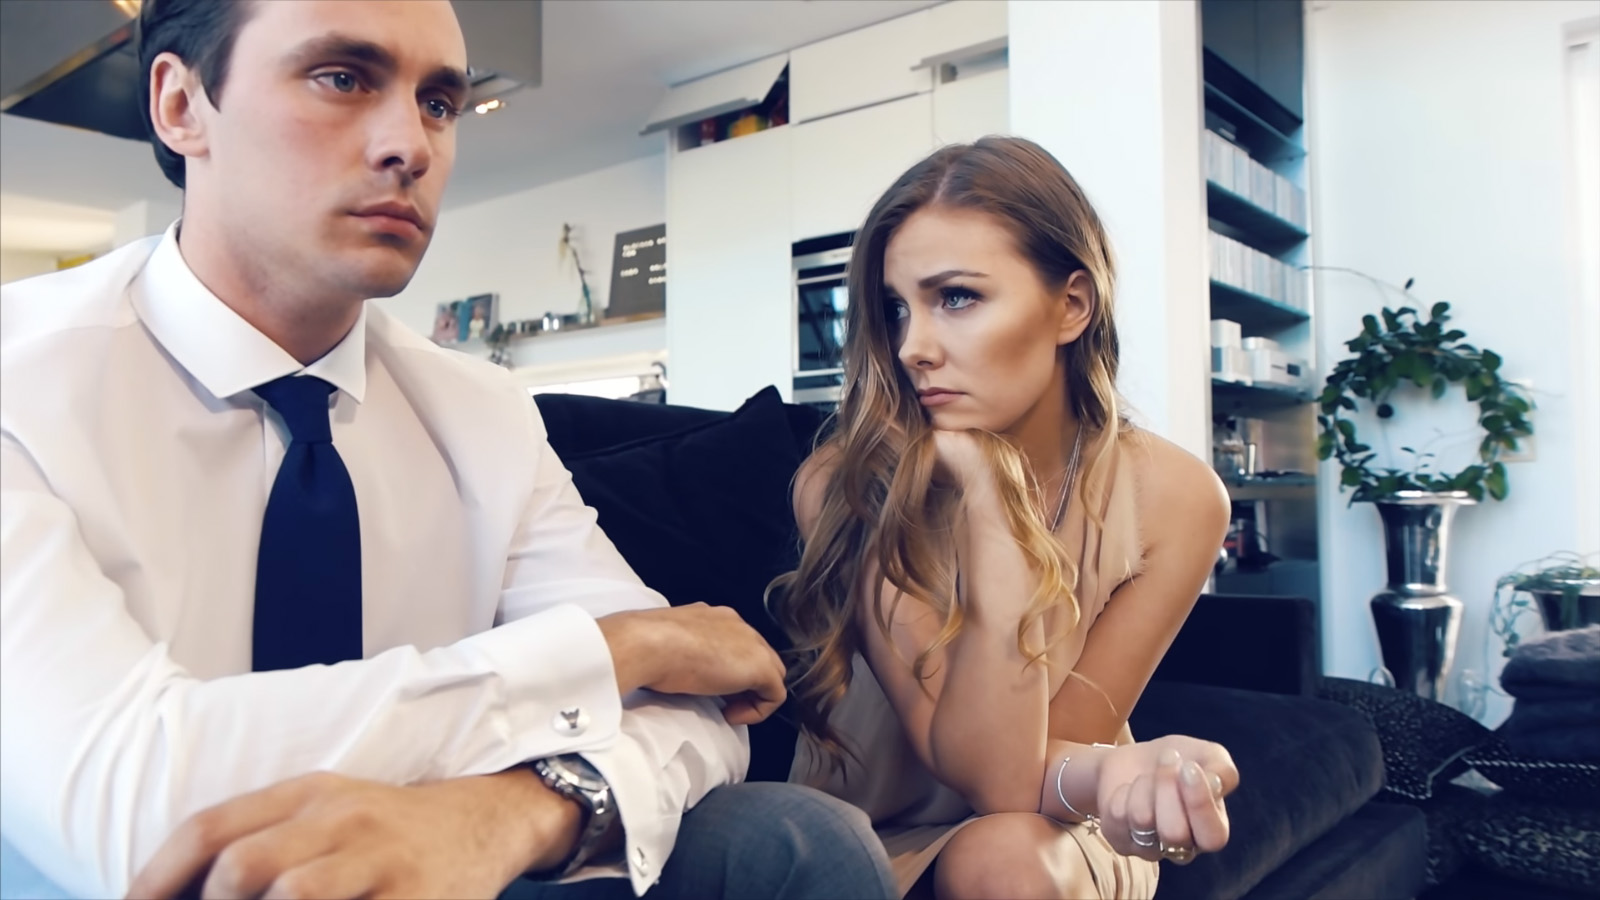 Adult gallery dress strip video